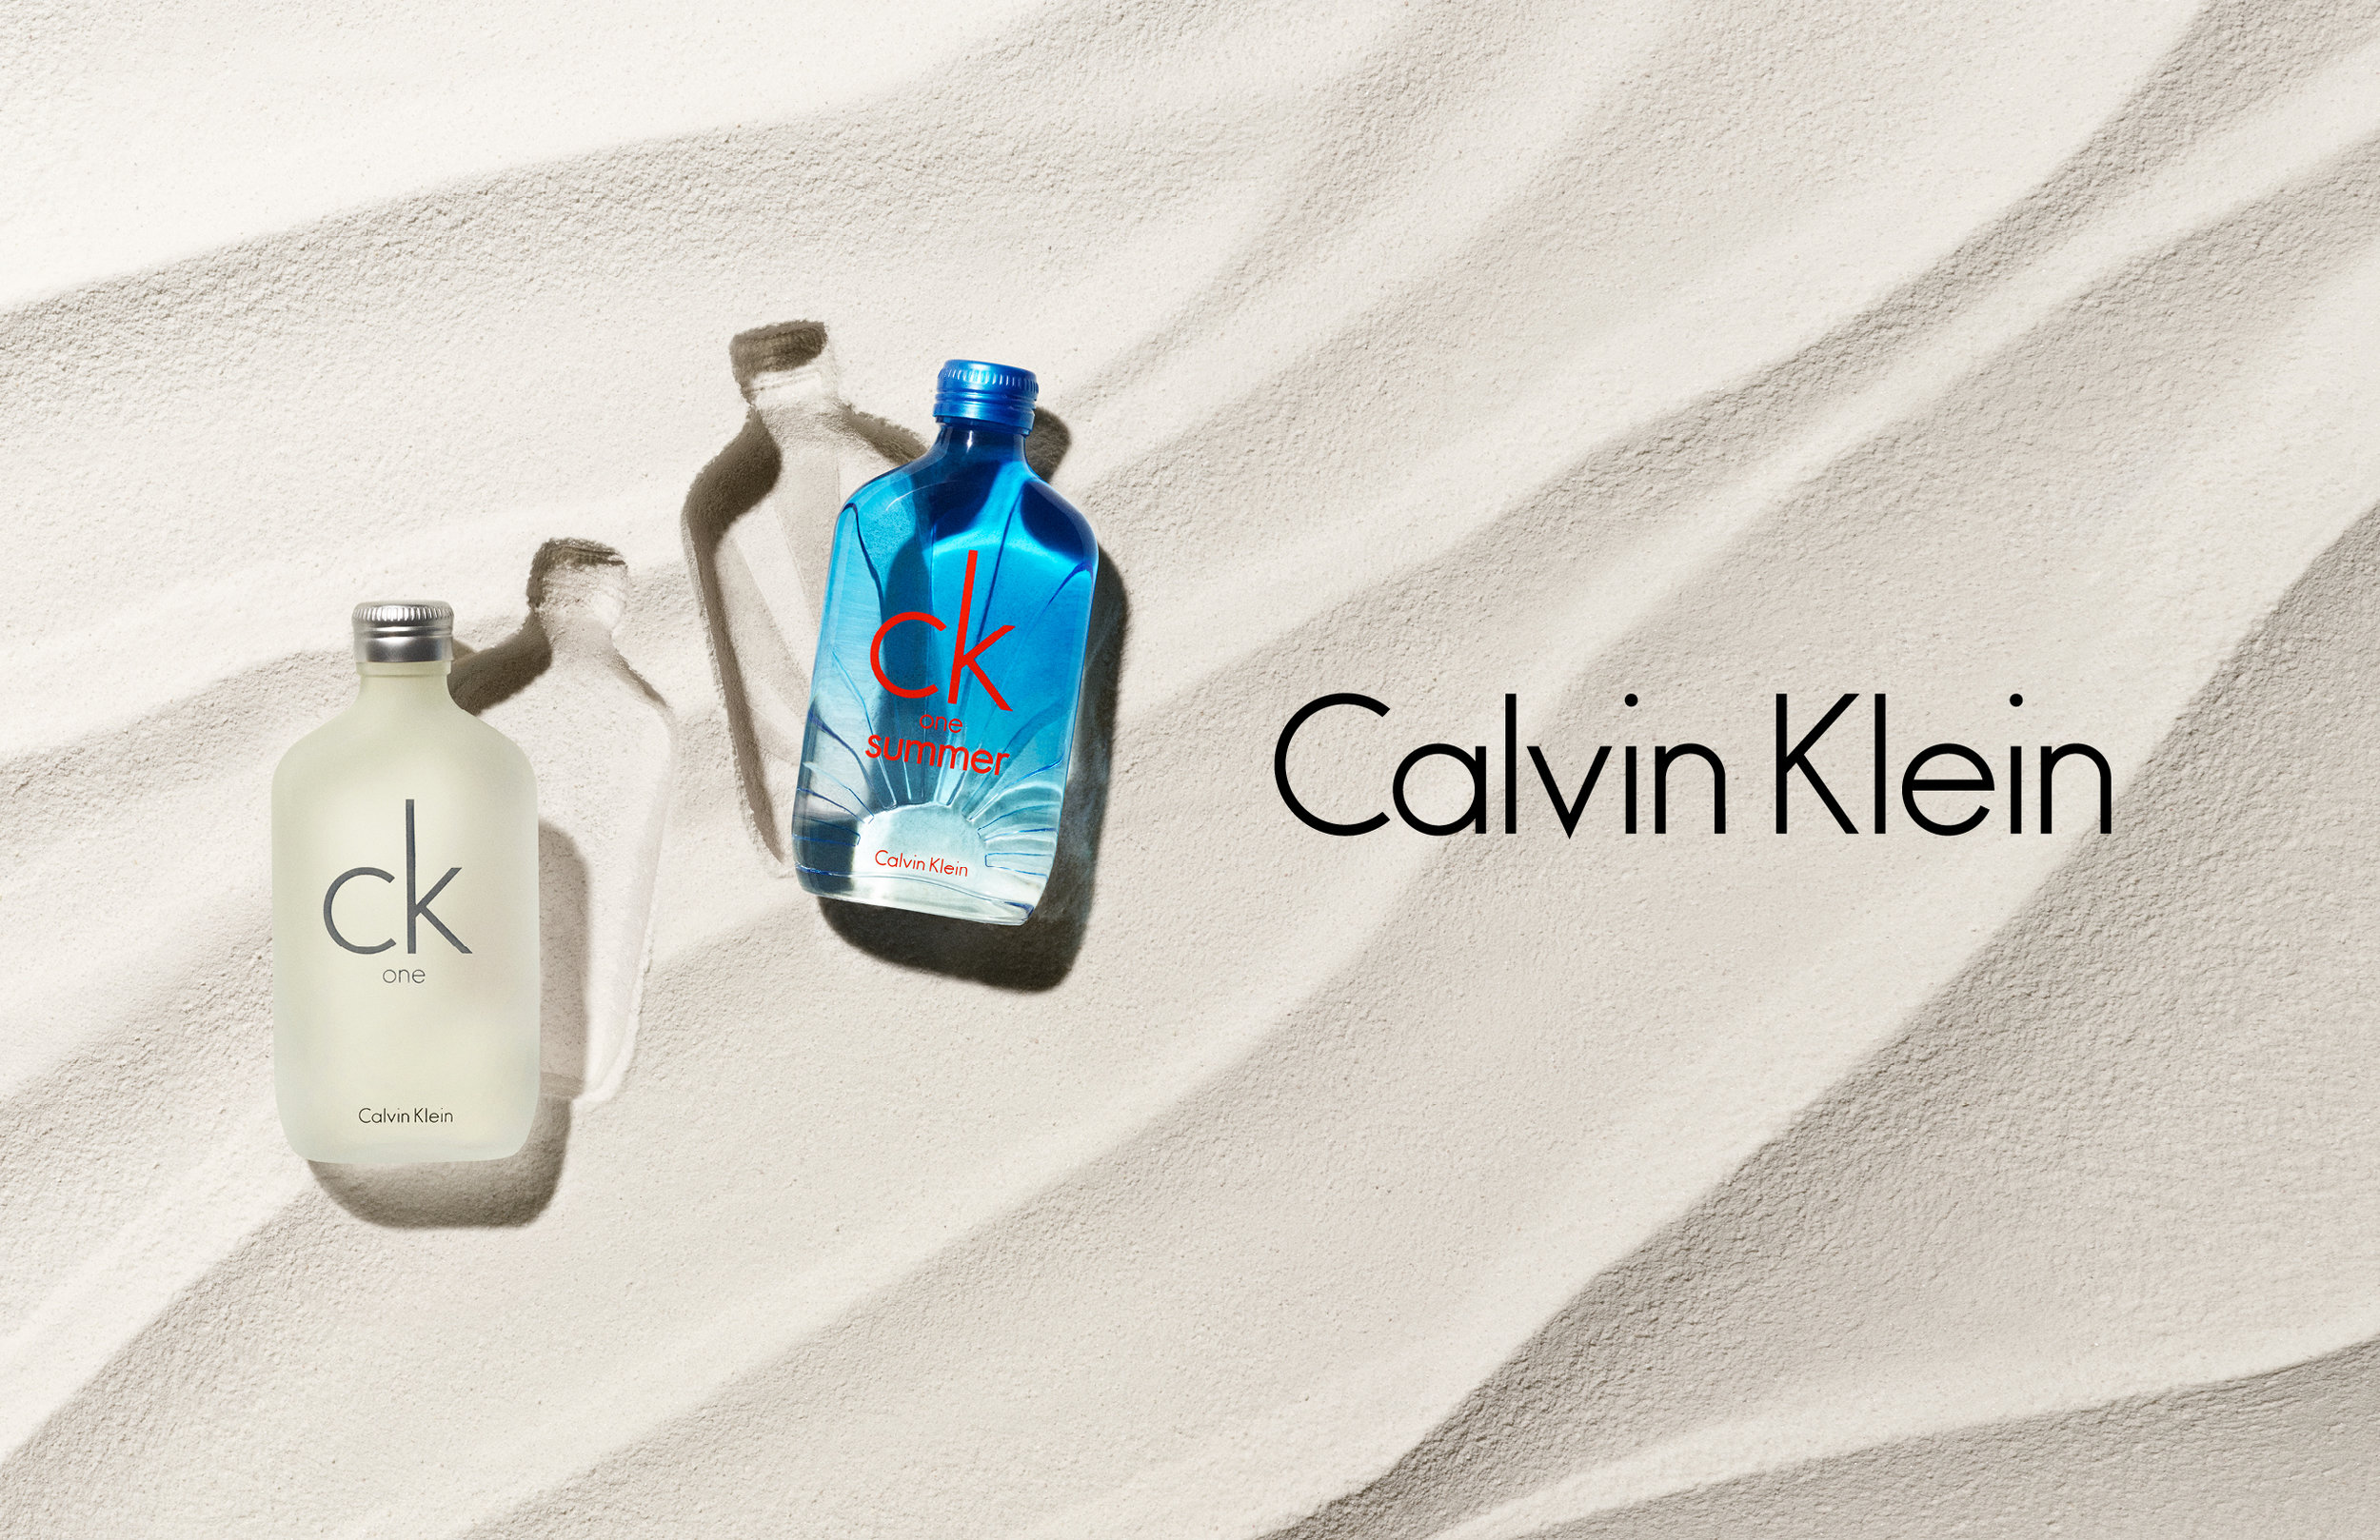 #calvinklein #fragrance #campaign #fashion #jimkaemmerling